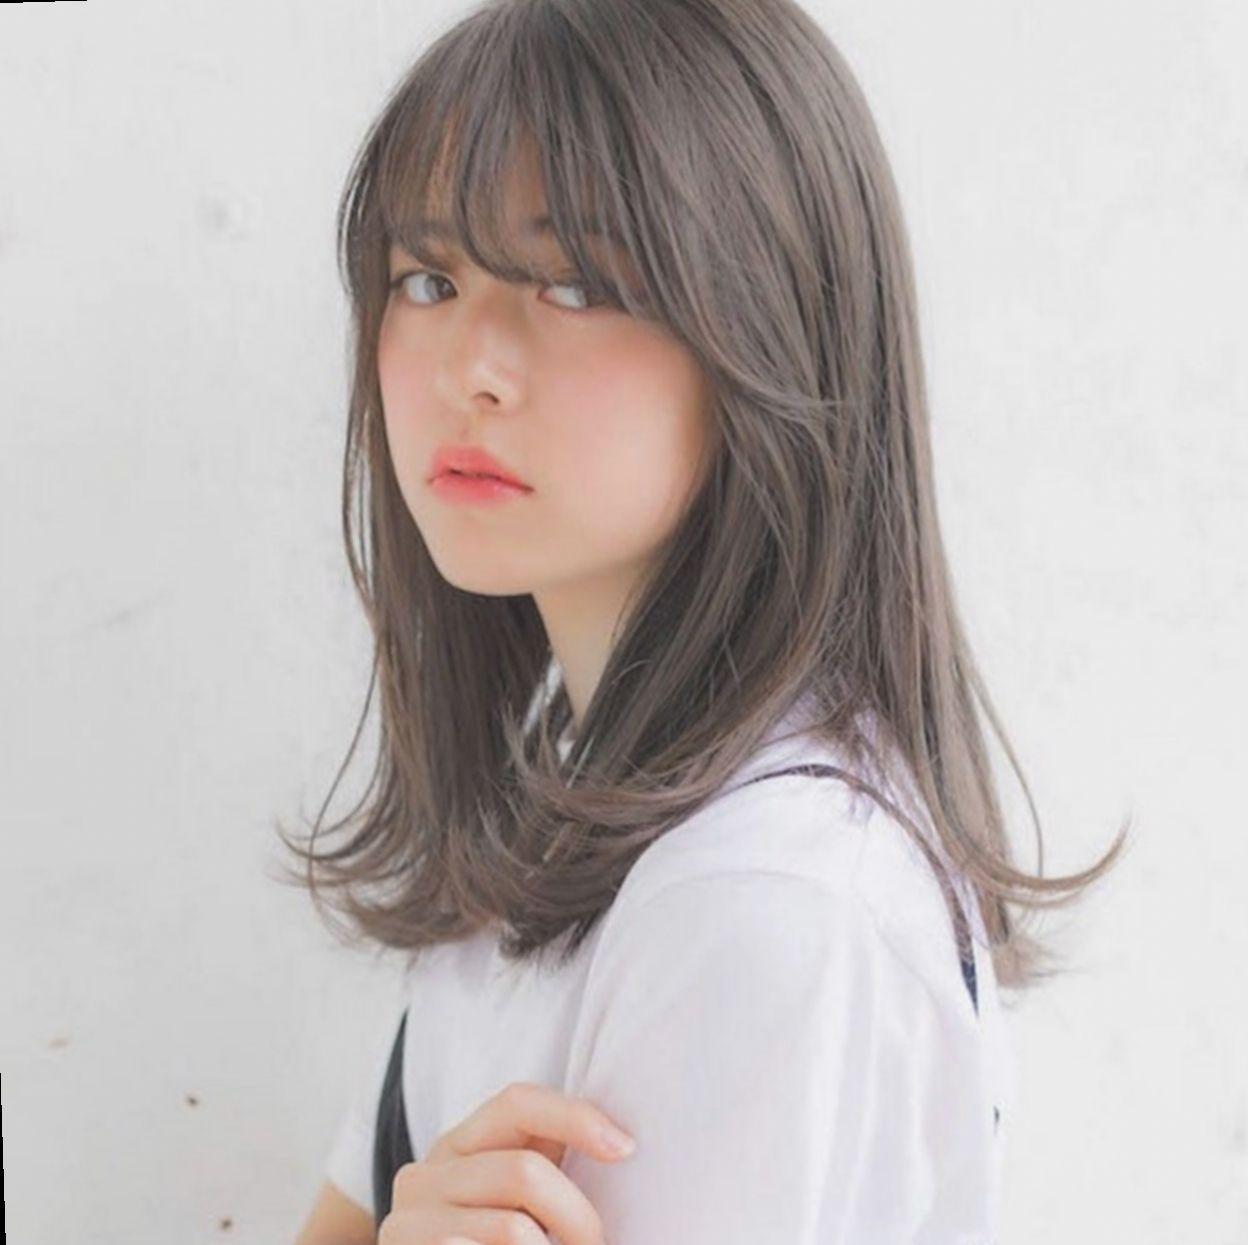 Pin By Nath L On Hairstyles Ulzzang Hair Korean Hairstyle Pretty Korean Girls